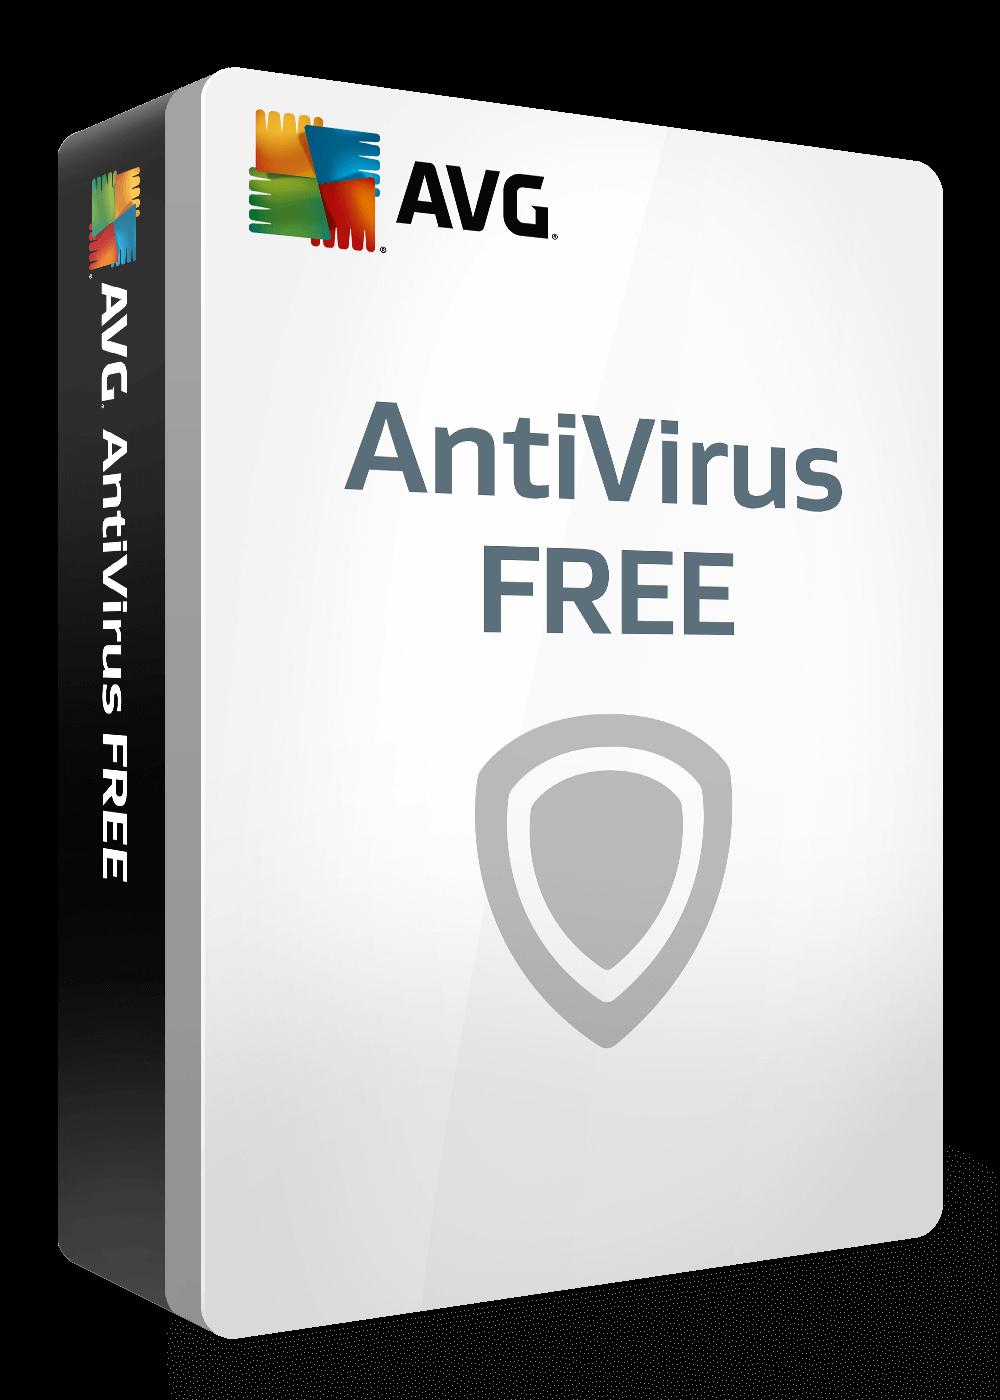 avg.com download